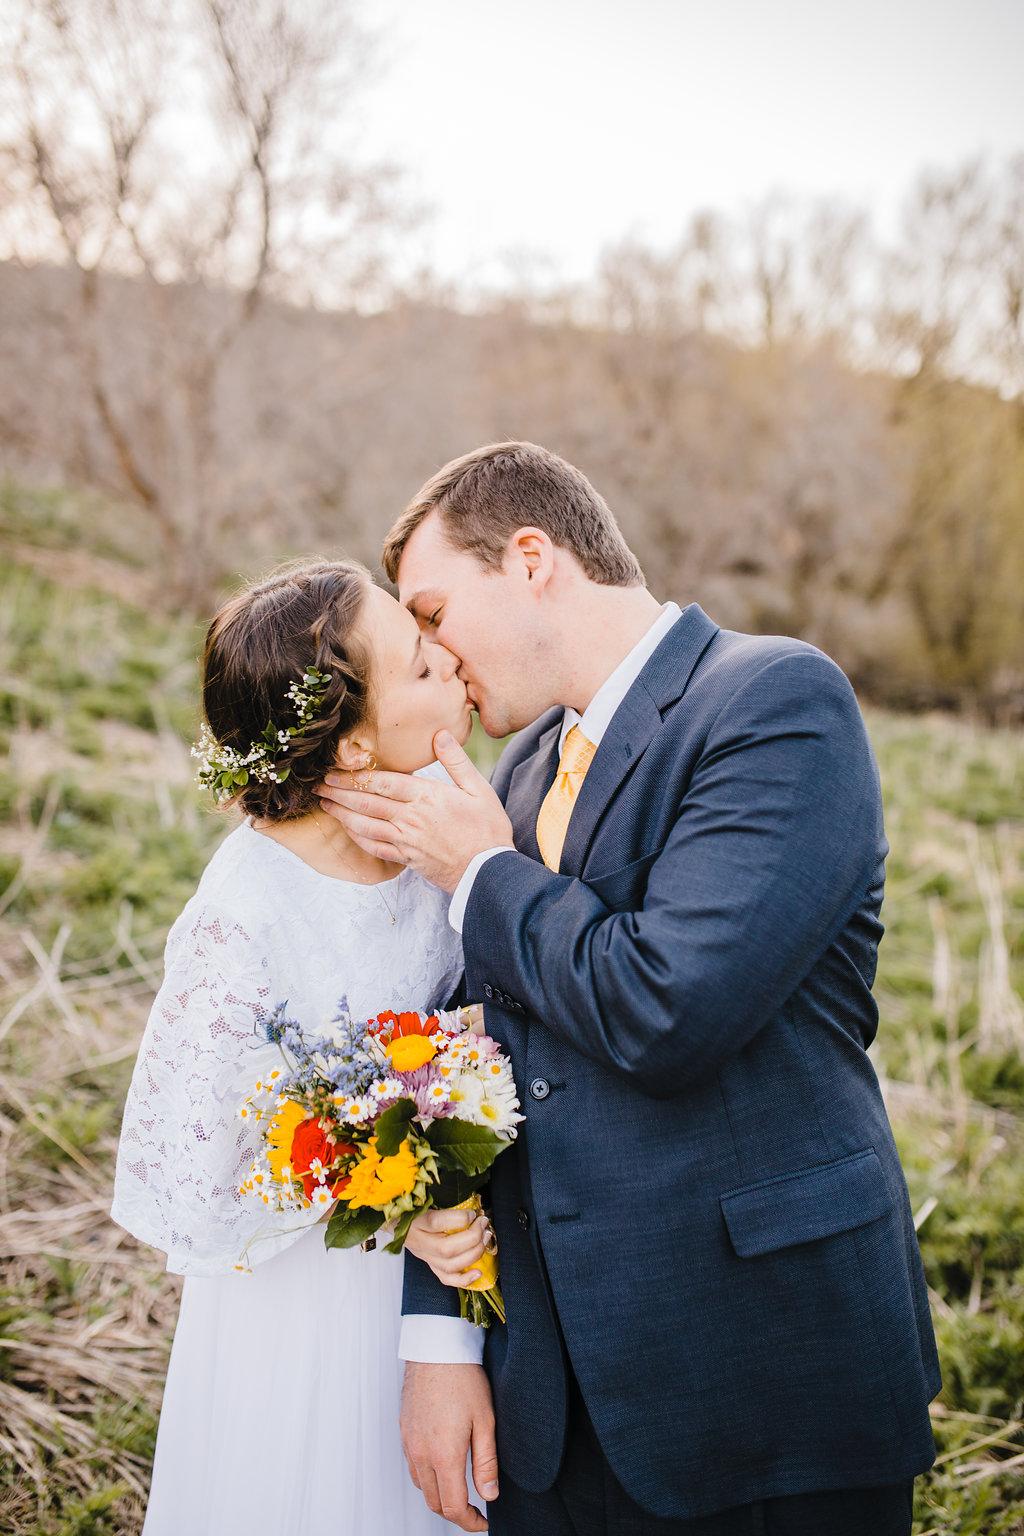 brigham city utah formals photography northern utah wedding photographer lds wedding brigham city mormon temple